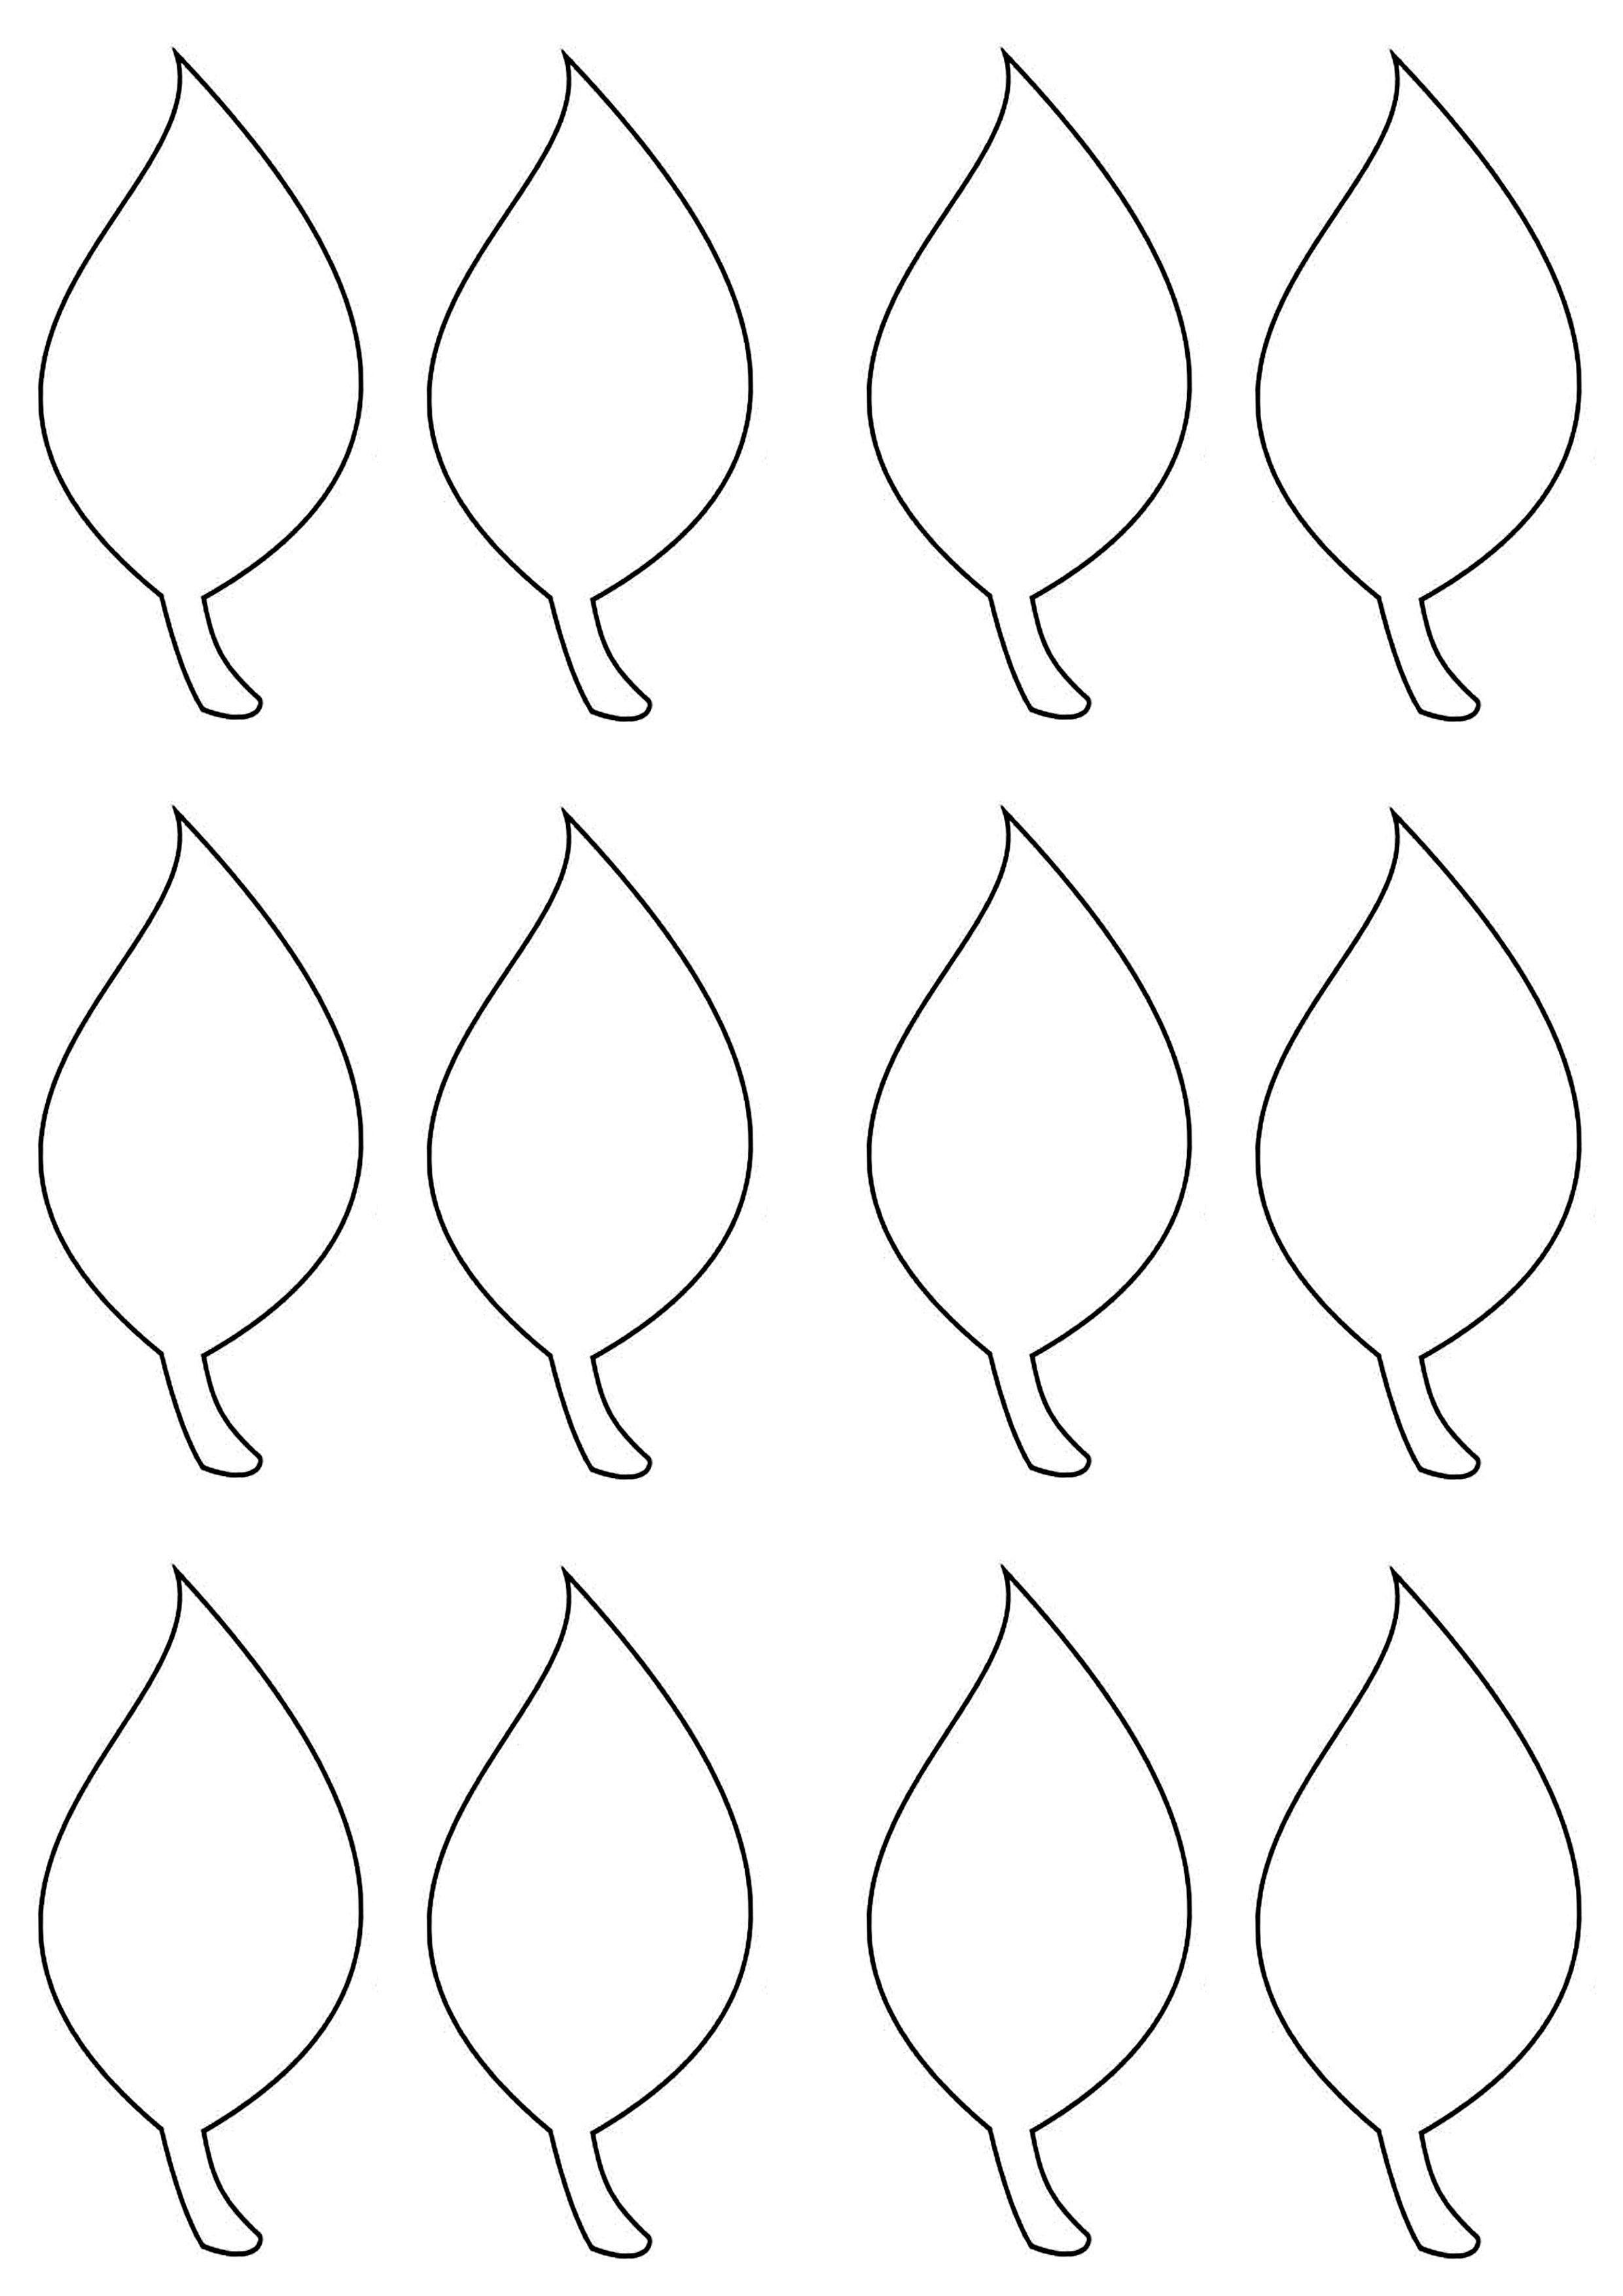 002 Impressive Blank Leaf Template With Line Image  Lines PrintableFull